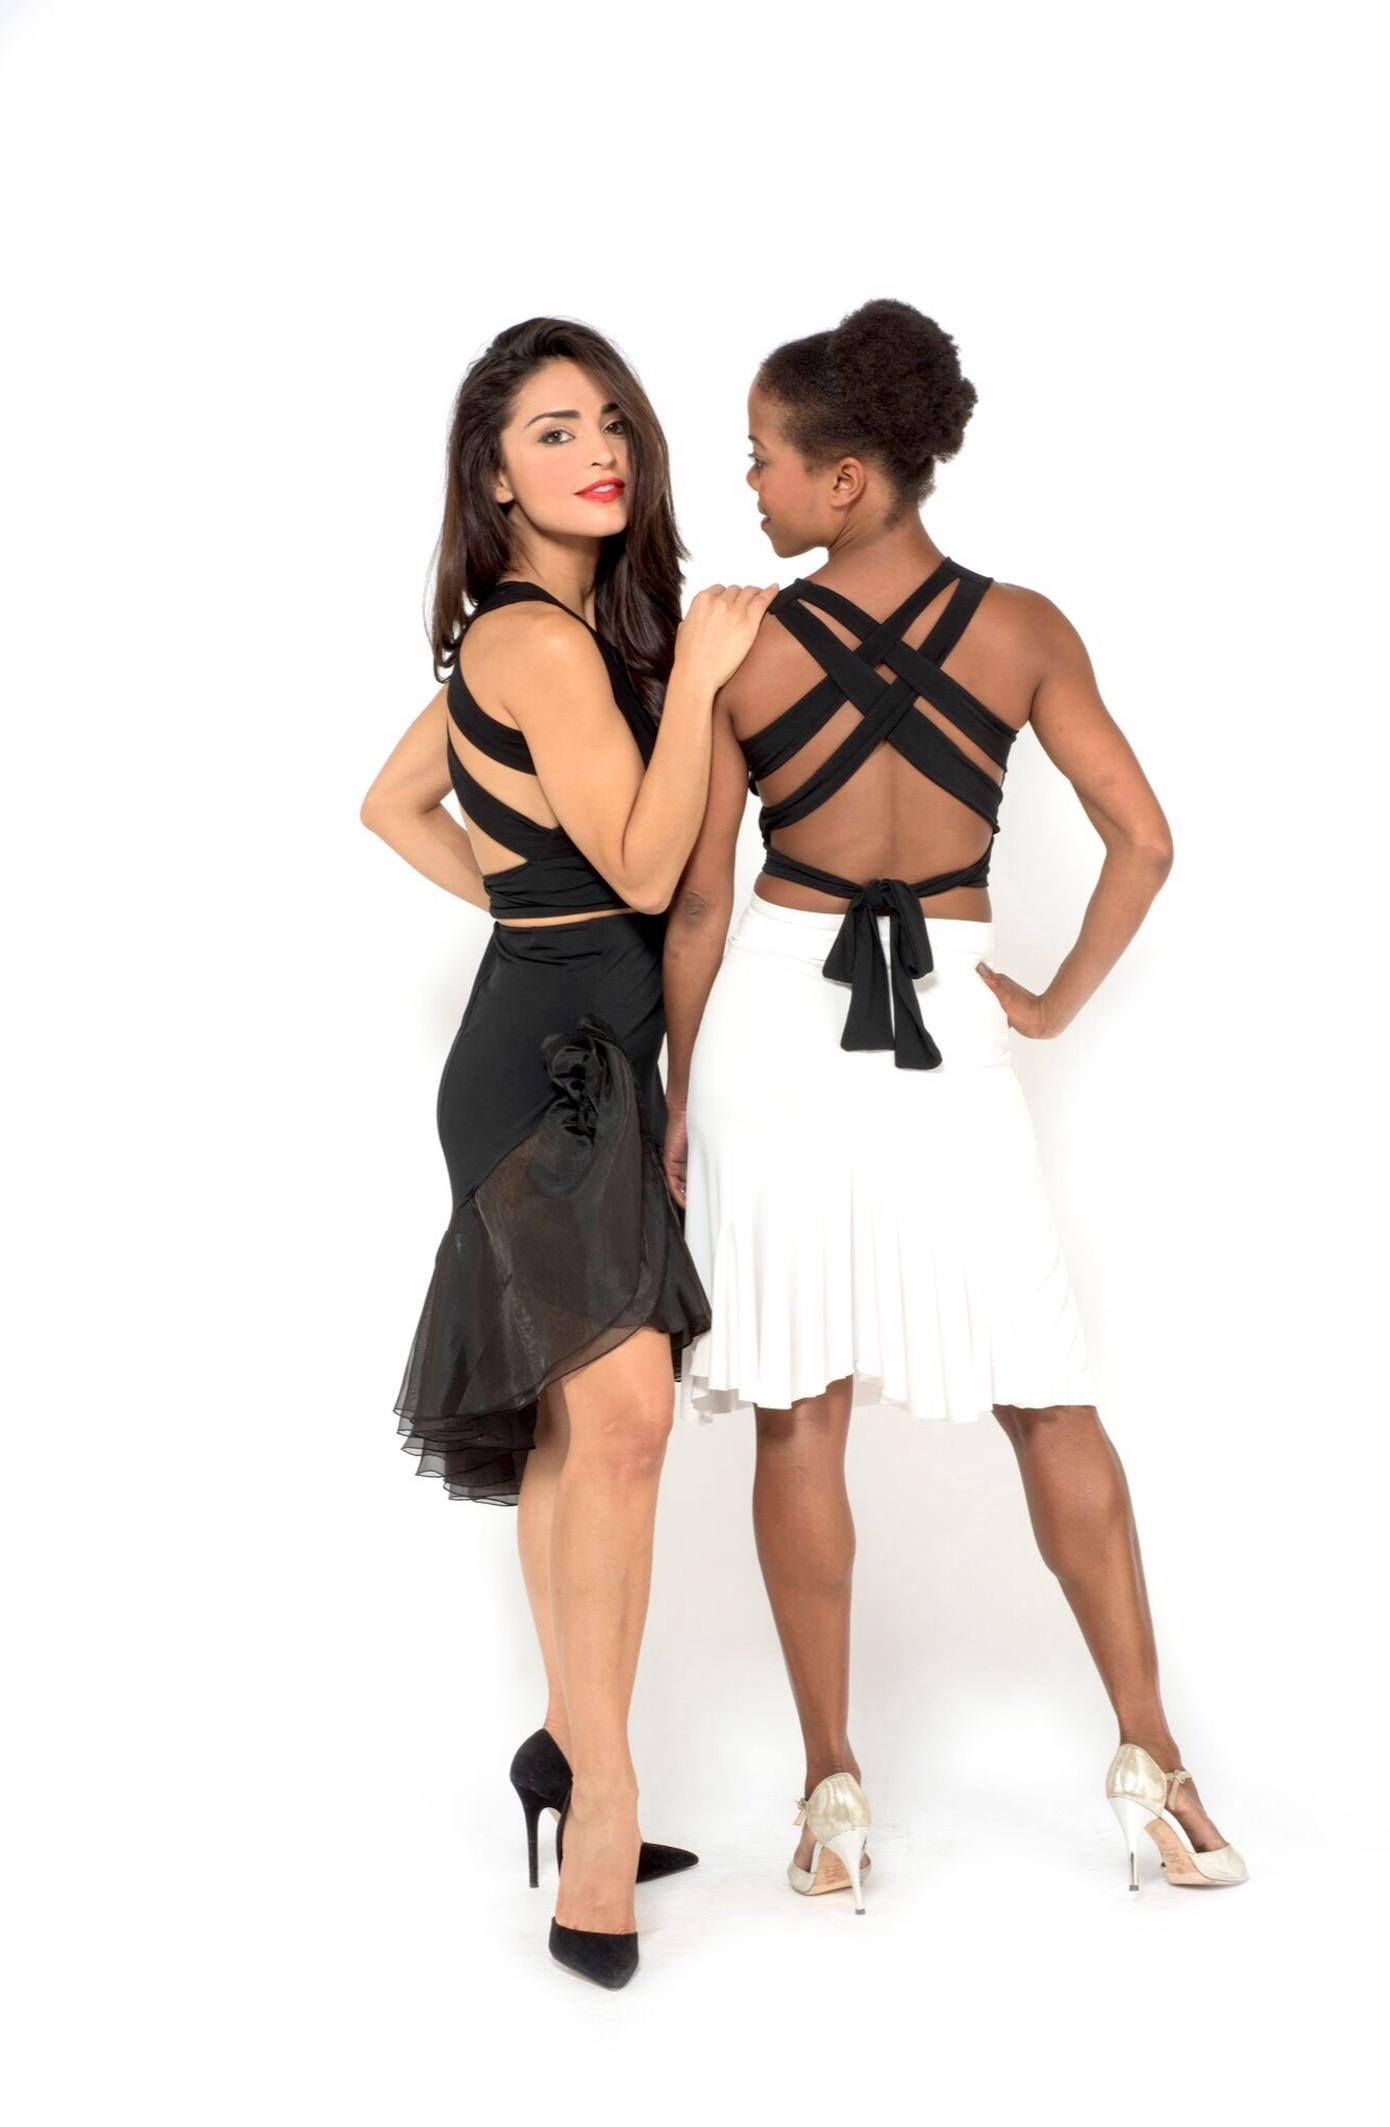 Black Argentine tango skirt